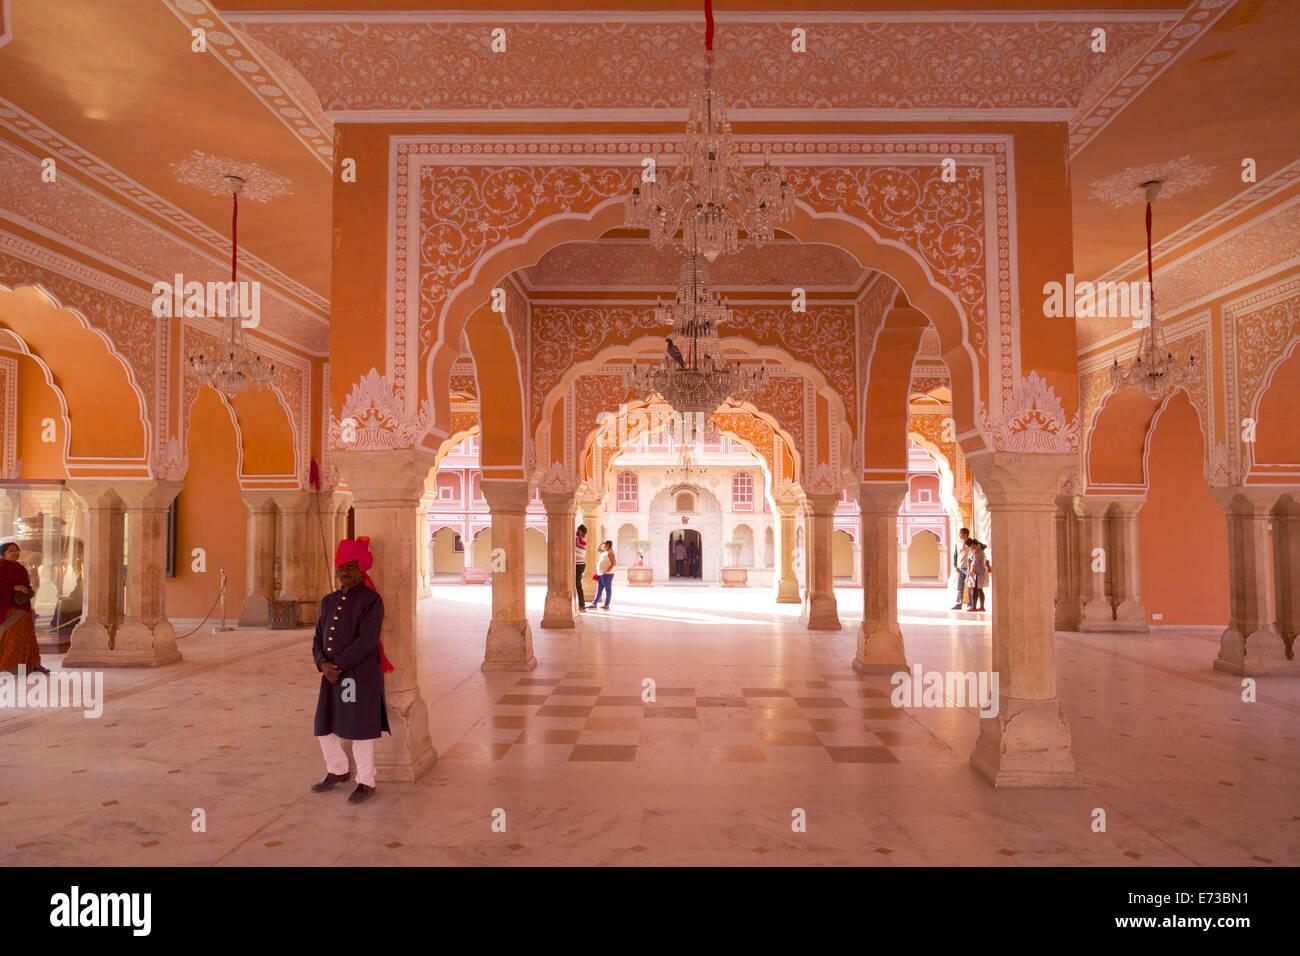 Sala del pubblico (Diwan-e-Khas), City Palace Jaipur, Rajasthan, India, Asia Immagini Stock